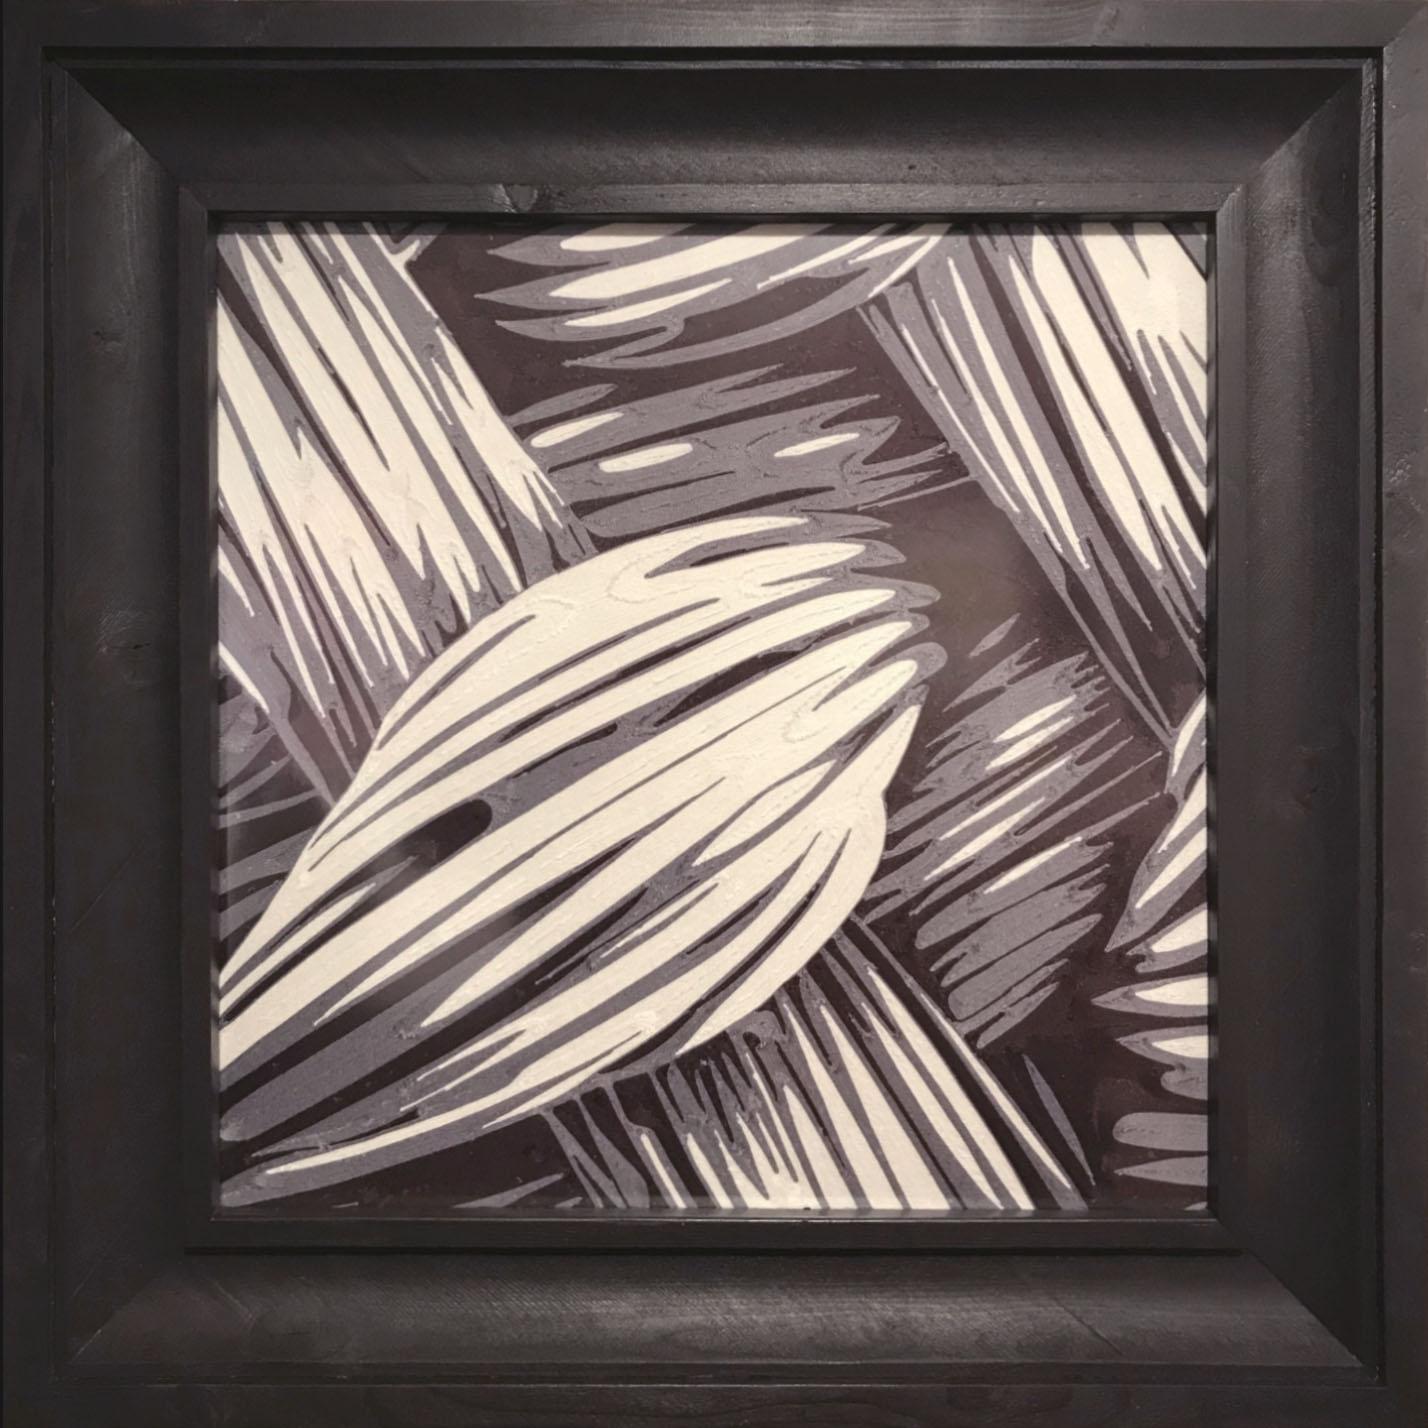 Fabrics 2, draadtechniek, 80 x 80 cm